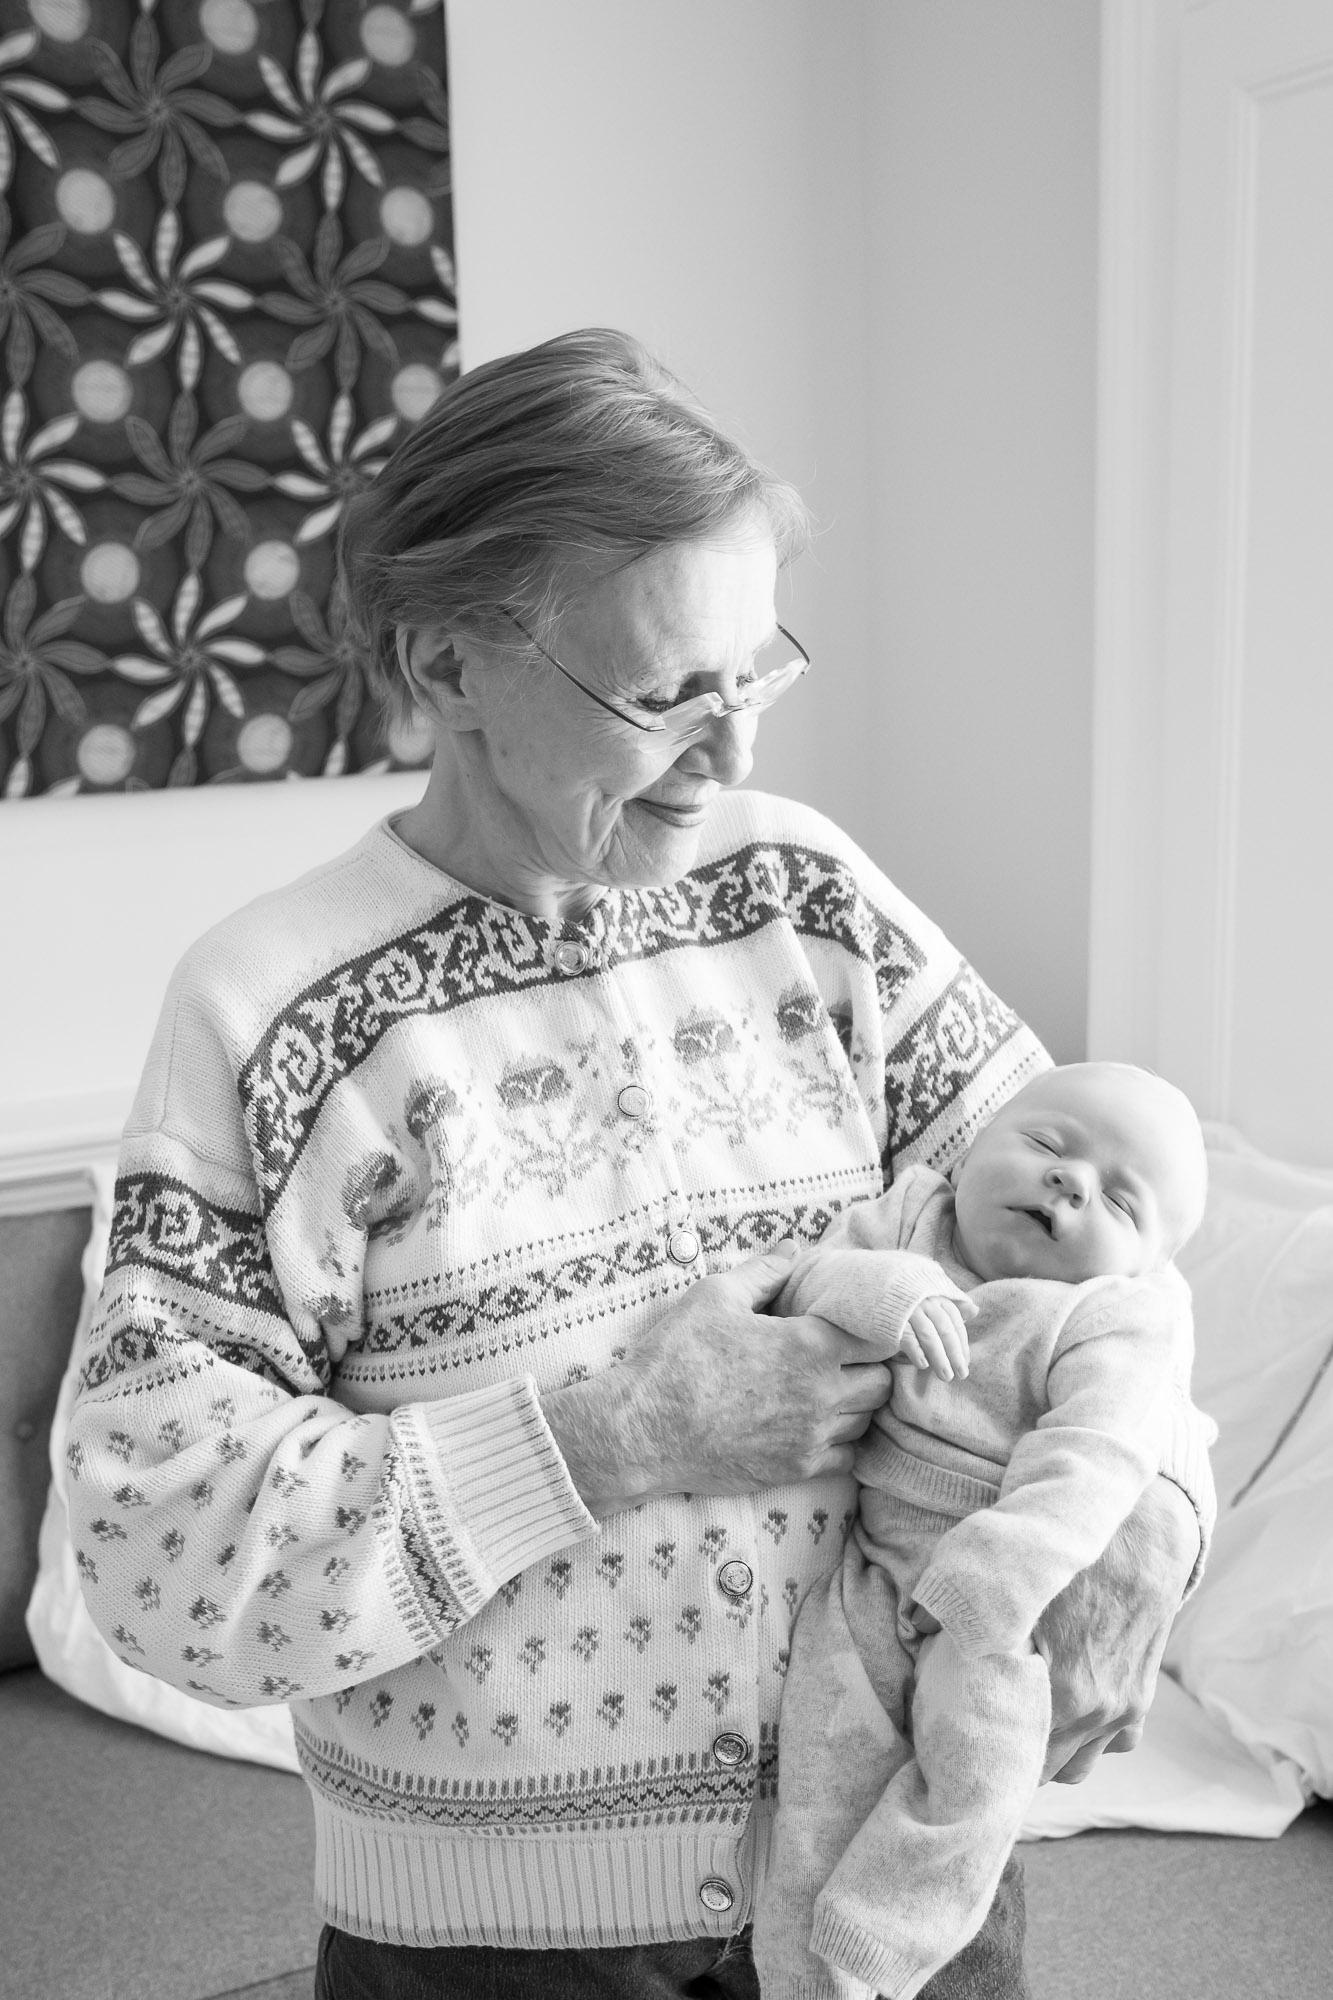 newborn-baby-family-portrait-photographer-100.jpg